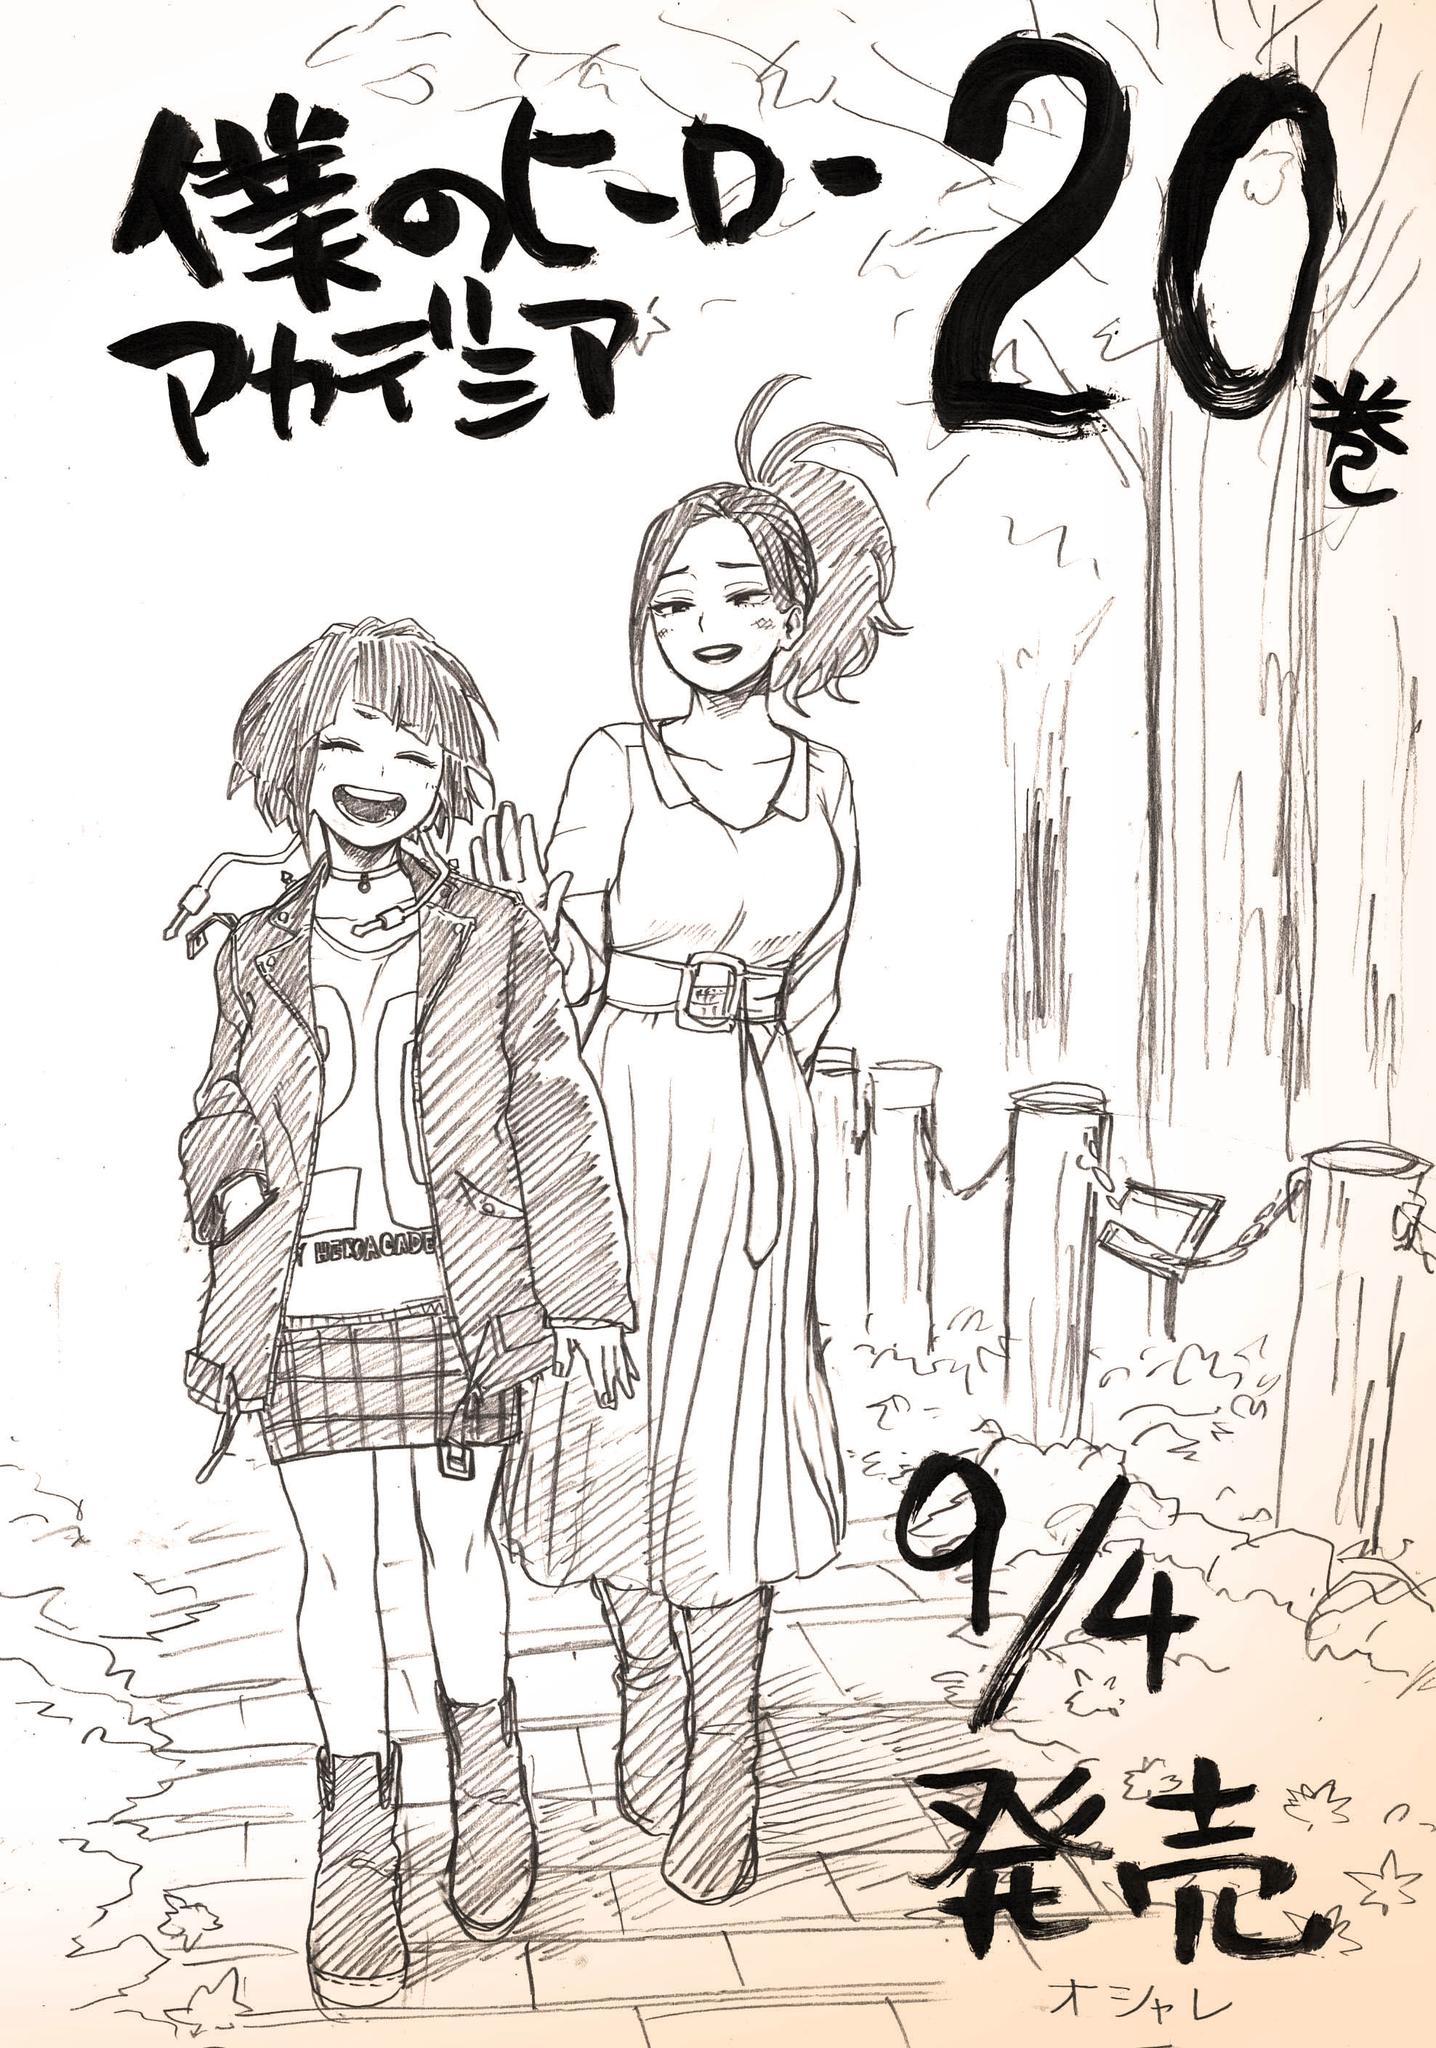 Volume 20 Sketch